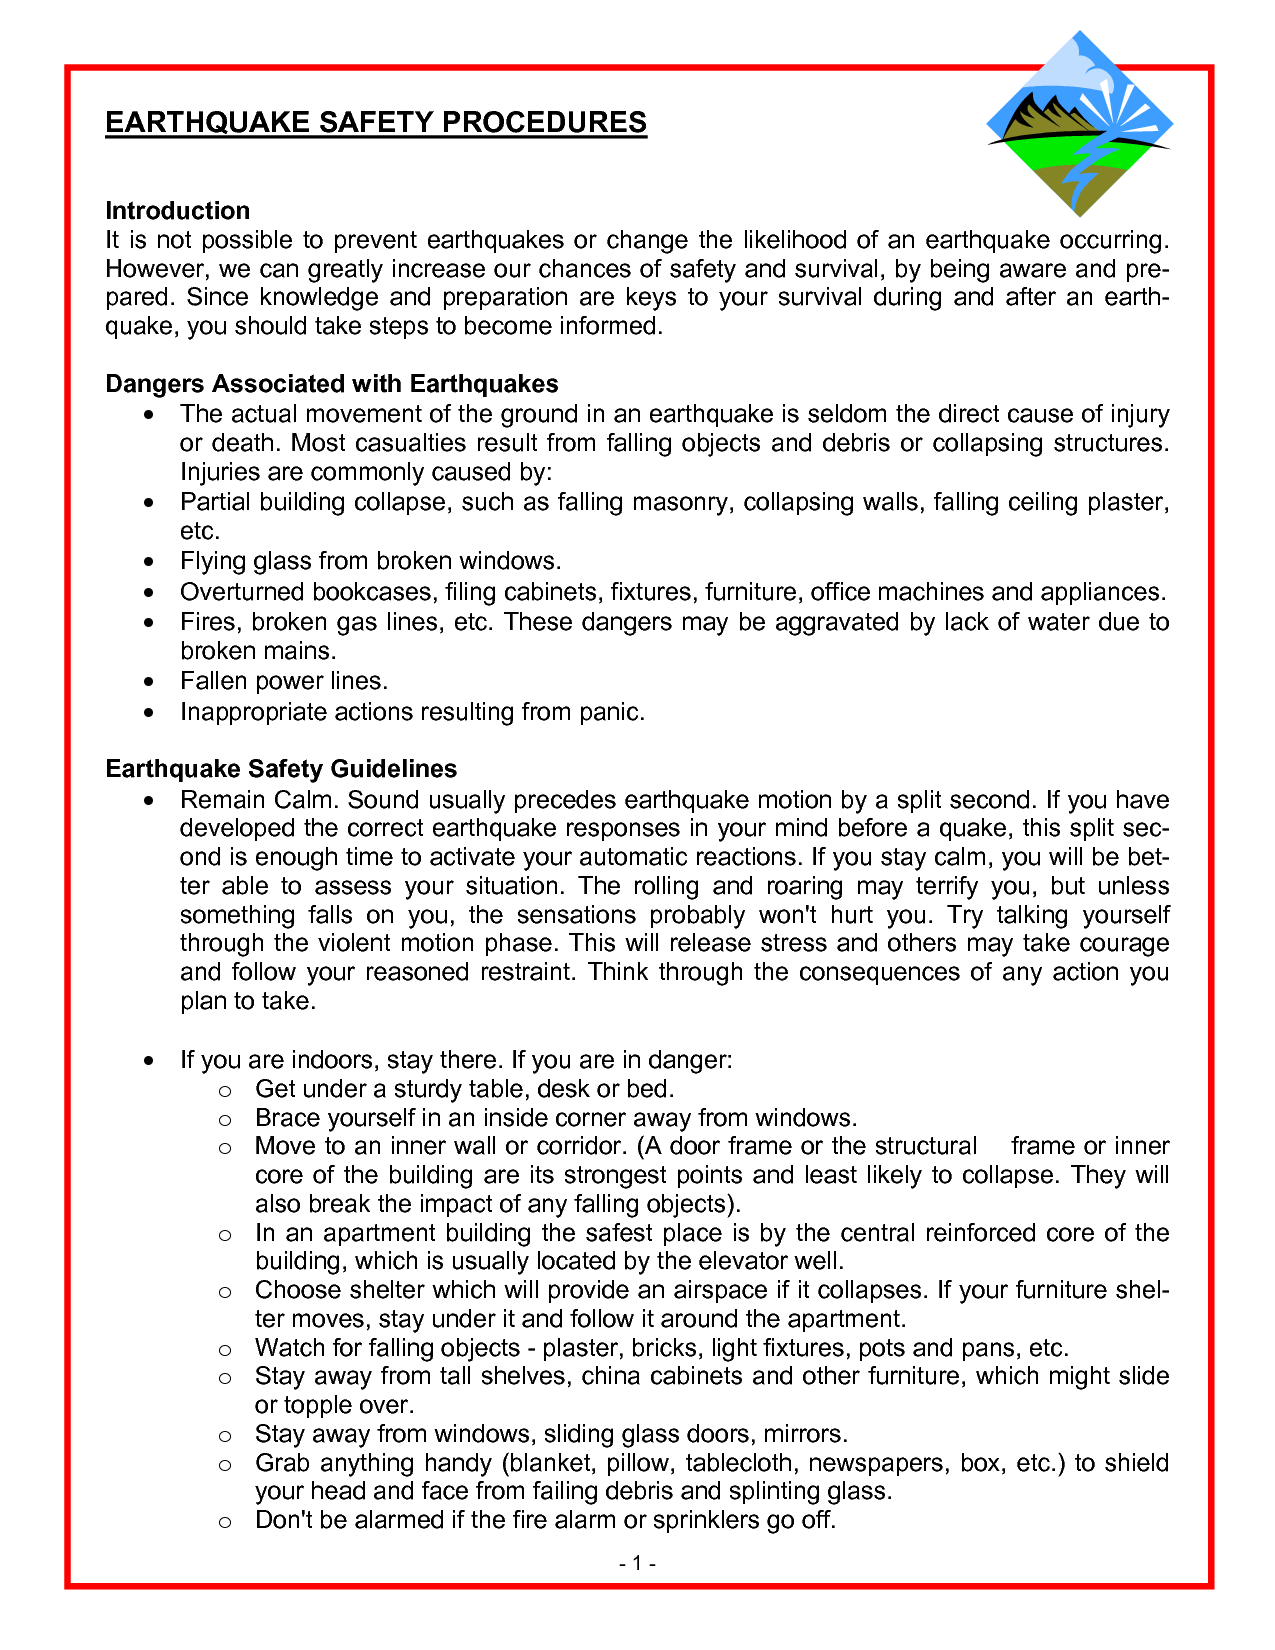 Earthquake Drill Procedures